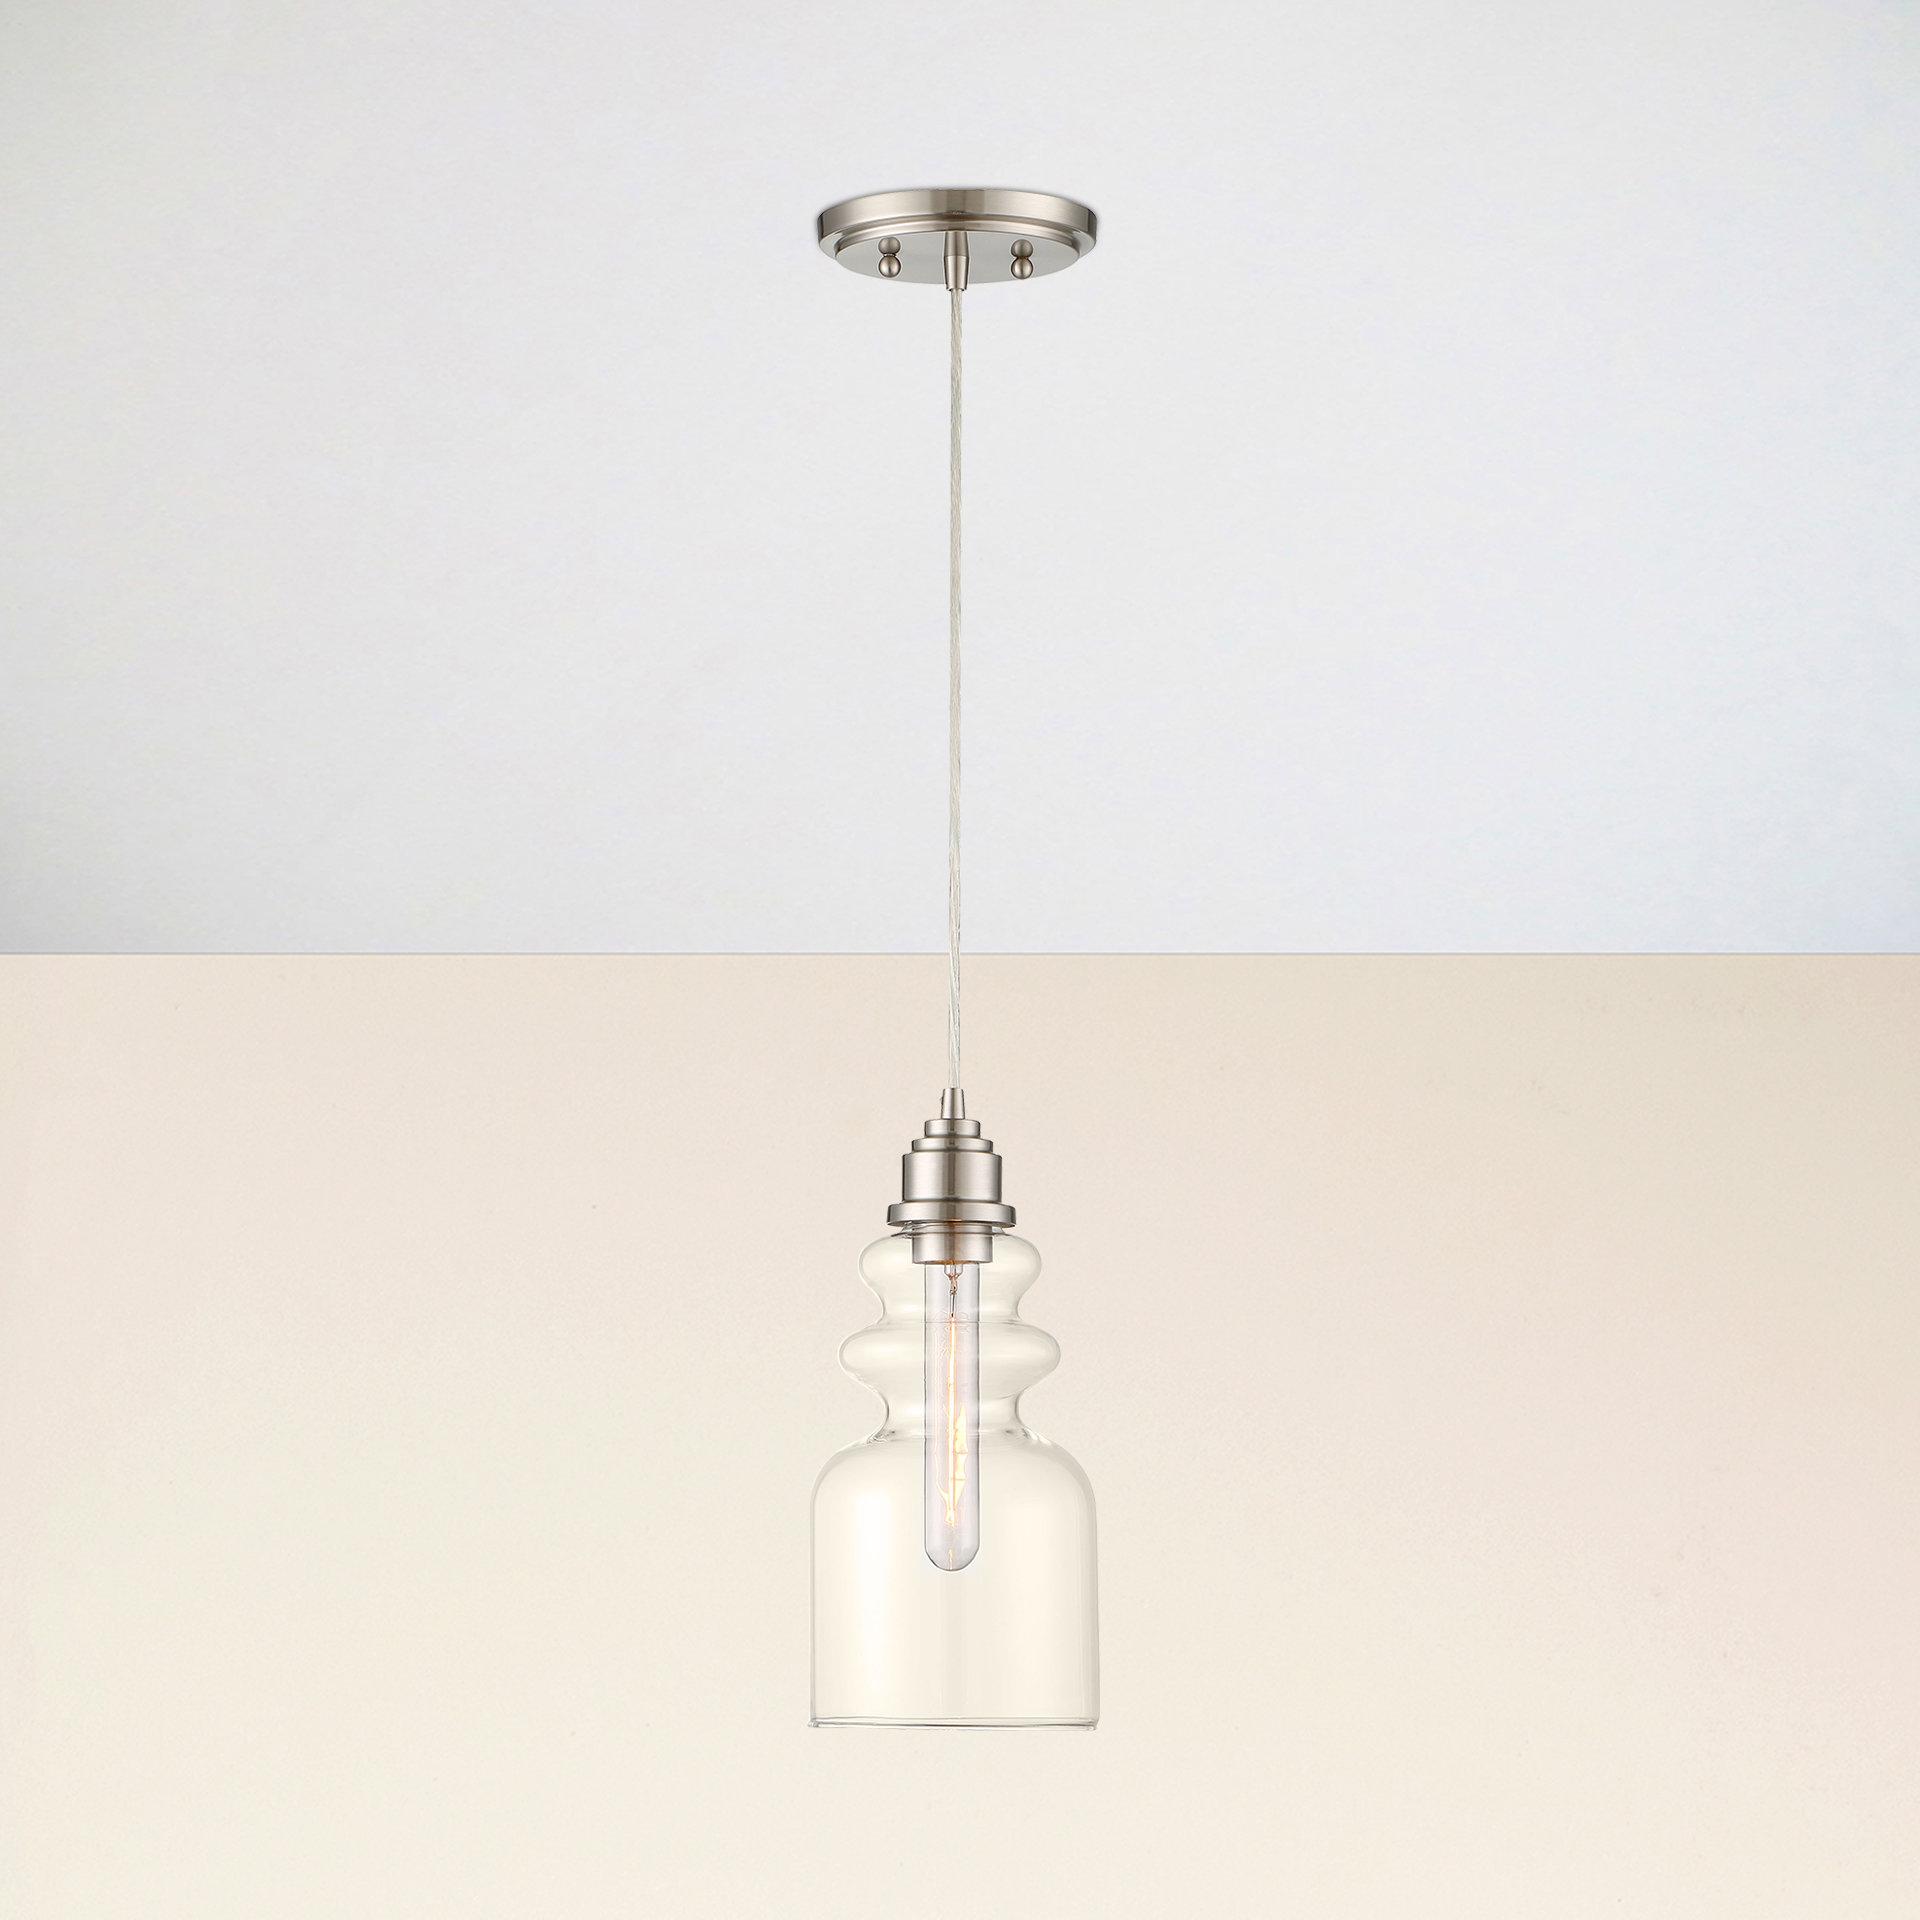 Reade 1 Light Bell Pendant Inside Most Current Wentzville 1 Light Single Bell Pendants (View 9 of 20)